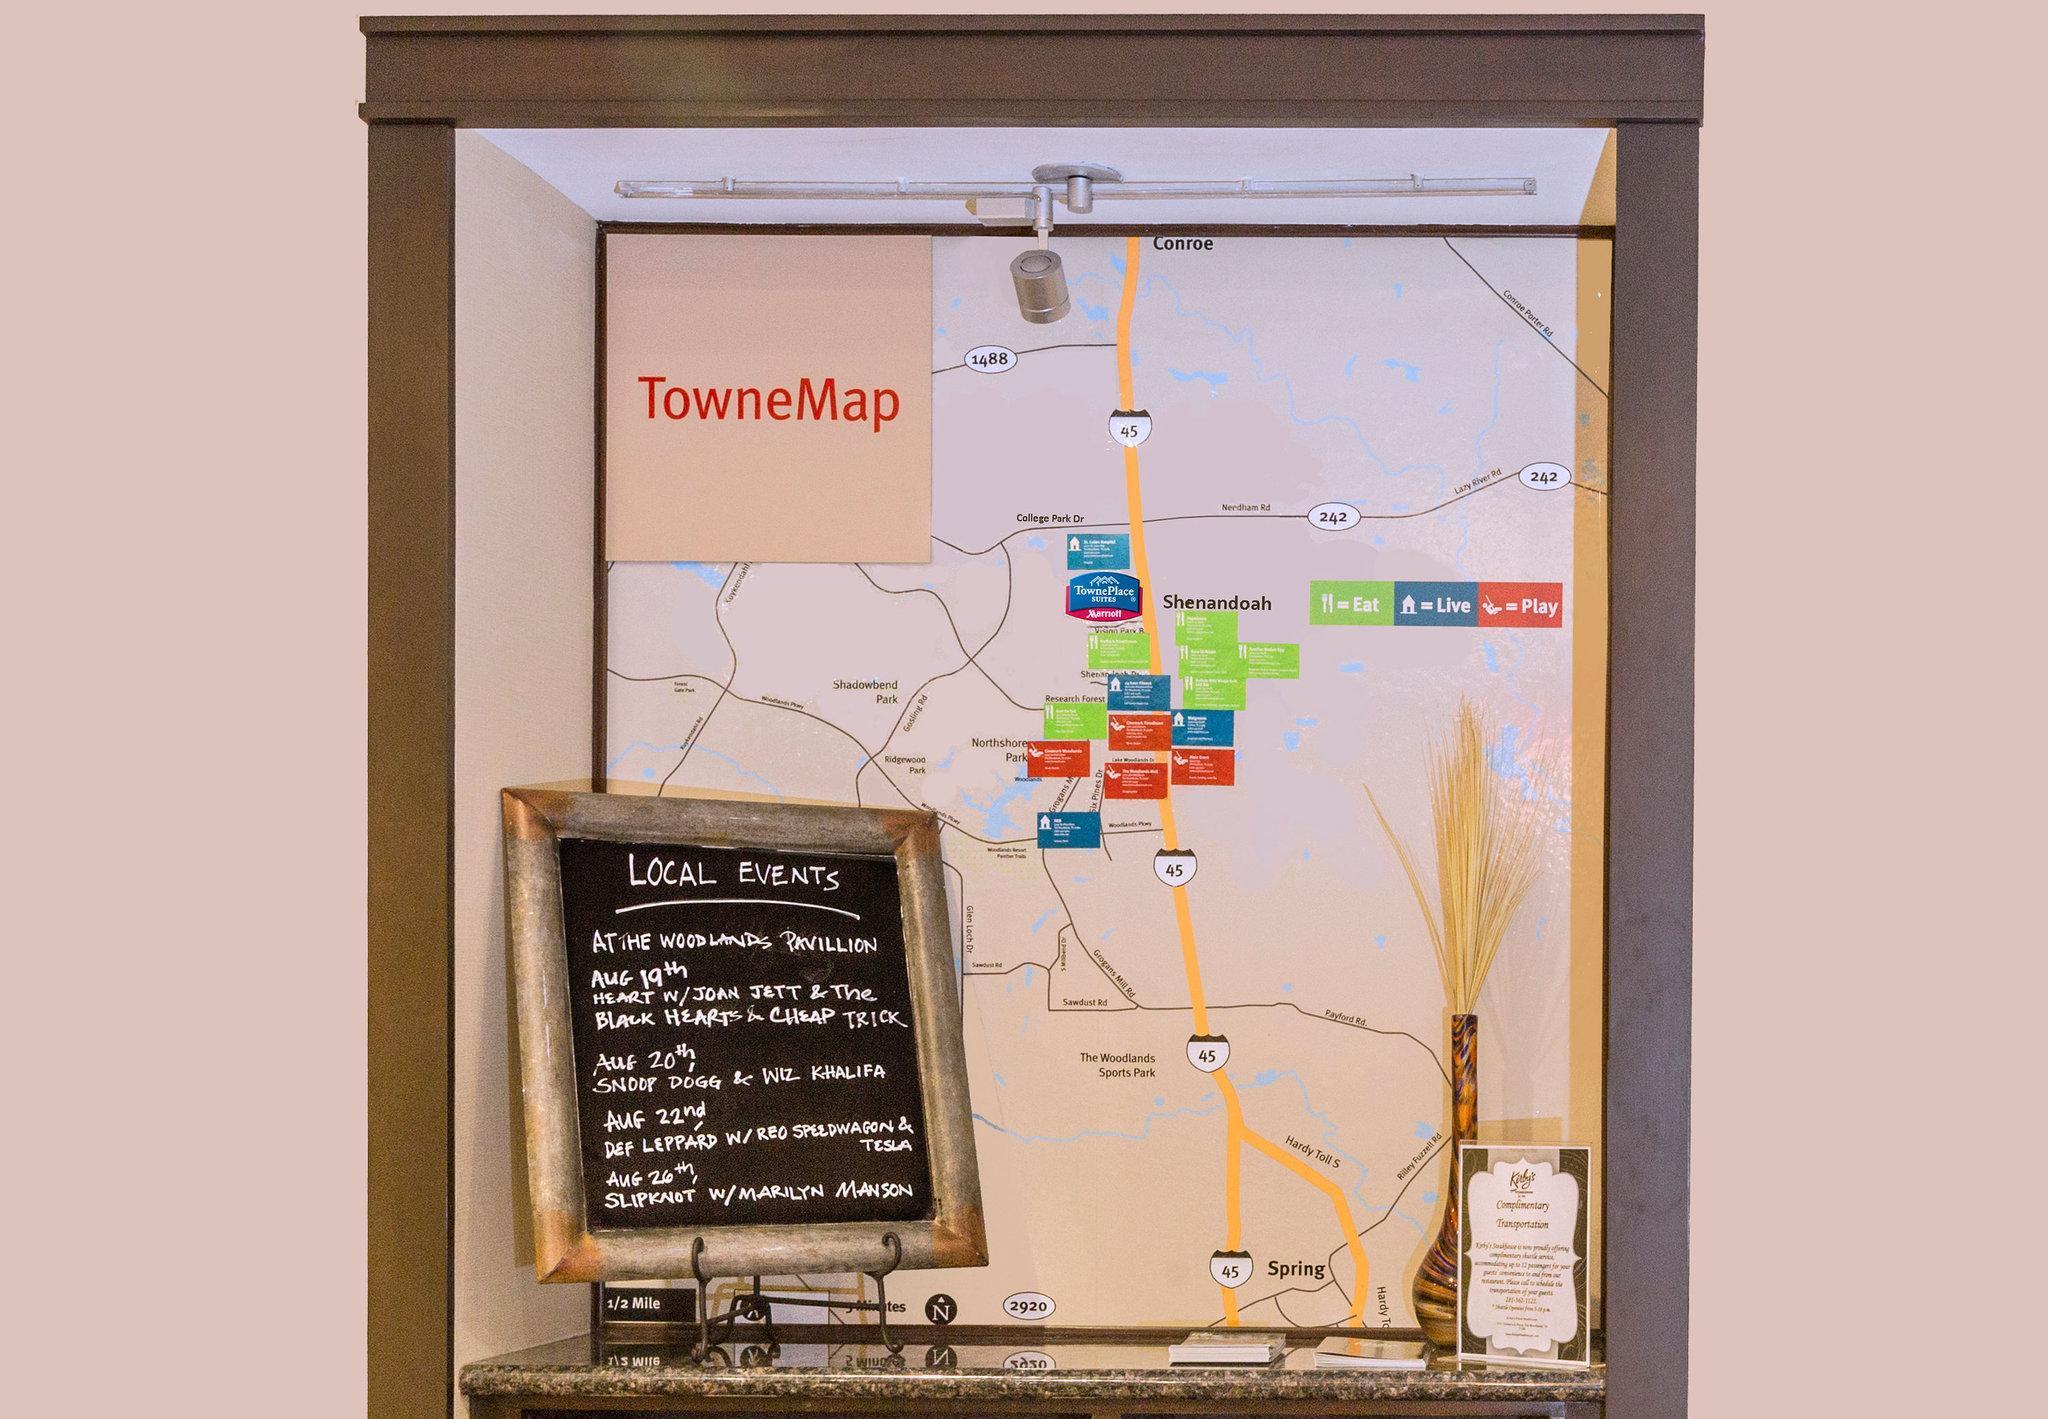 TownePlace Suites Houston North Shenandoah